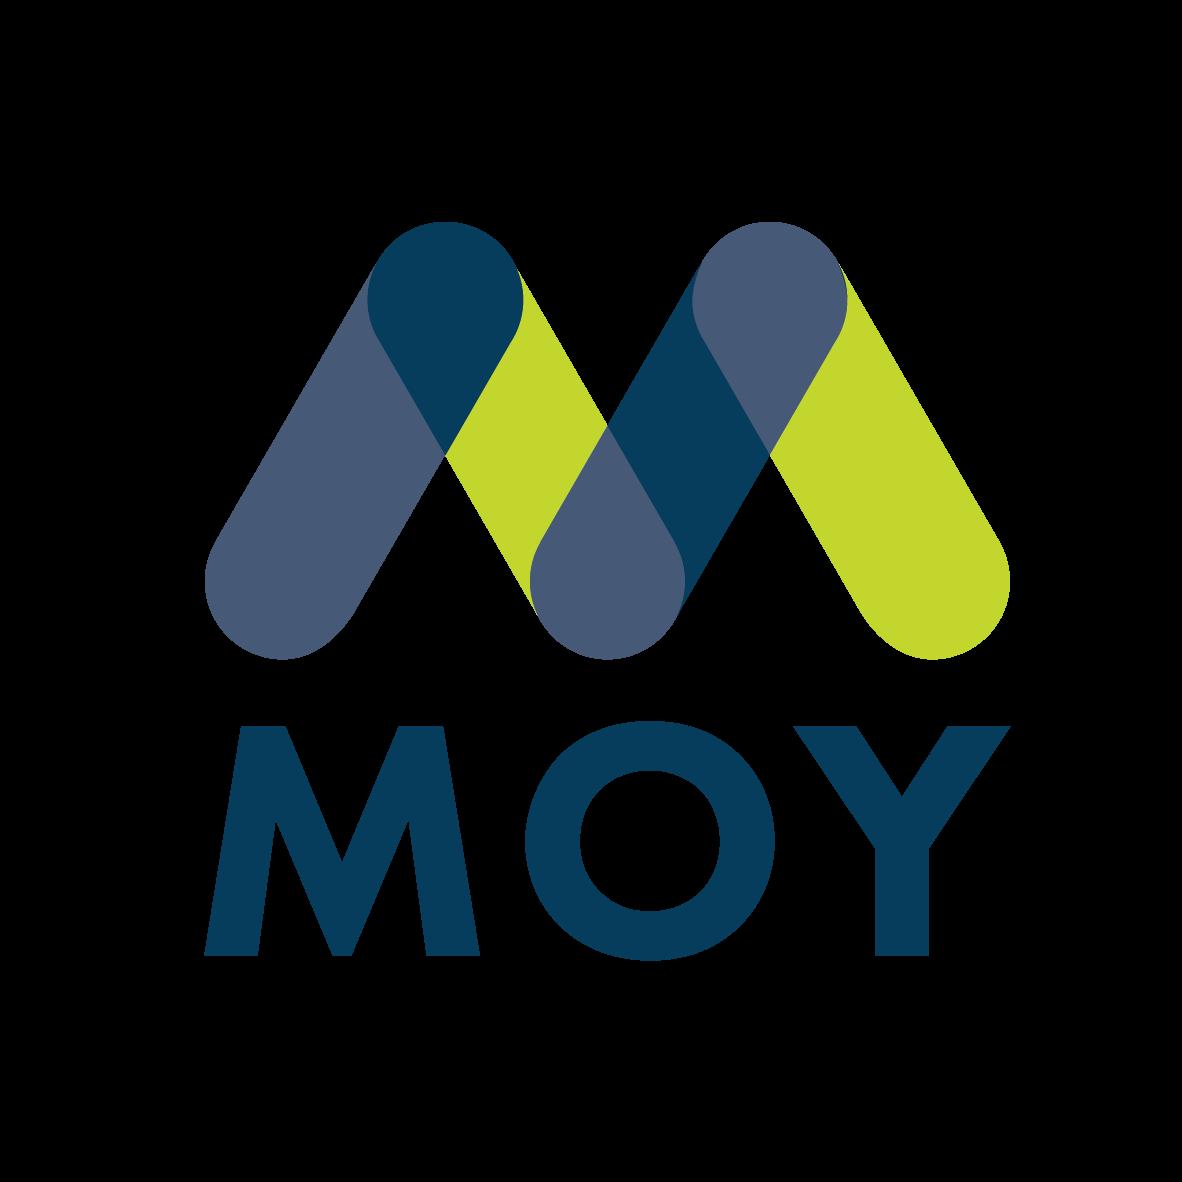 MOY Materials Logo transparent background